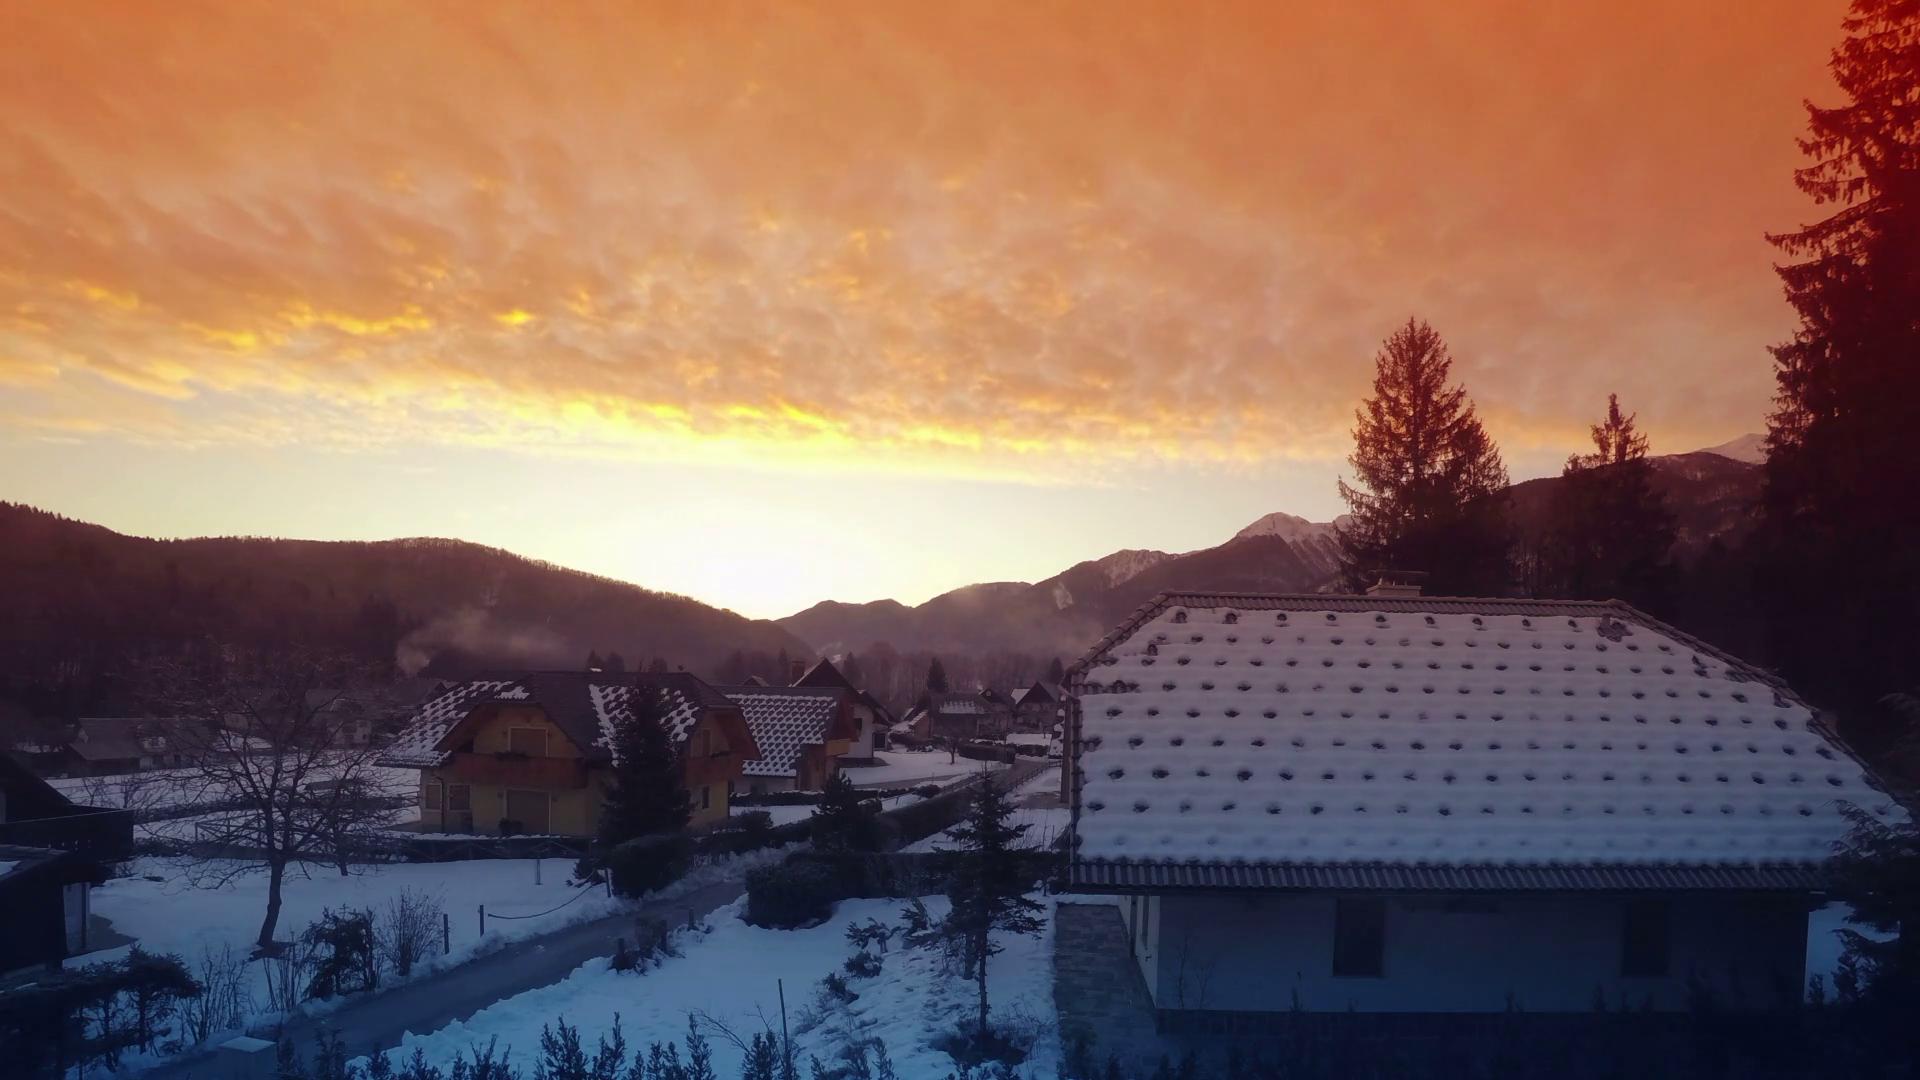 Idyllic winter sunrise photo